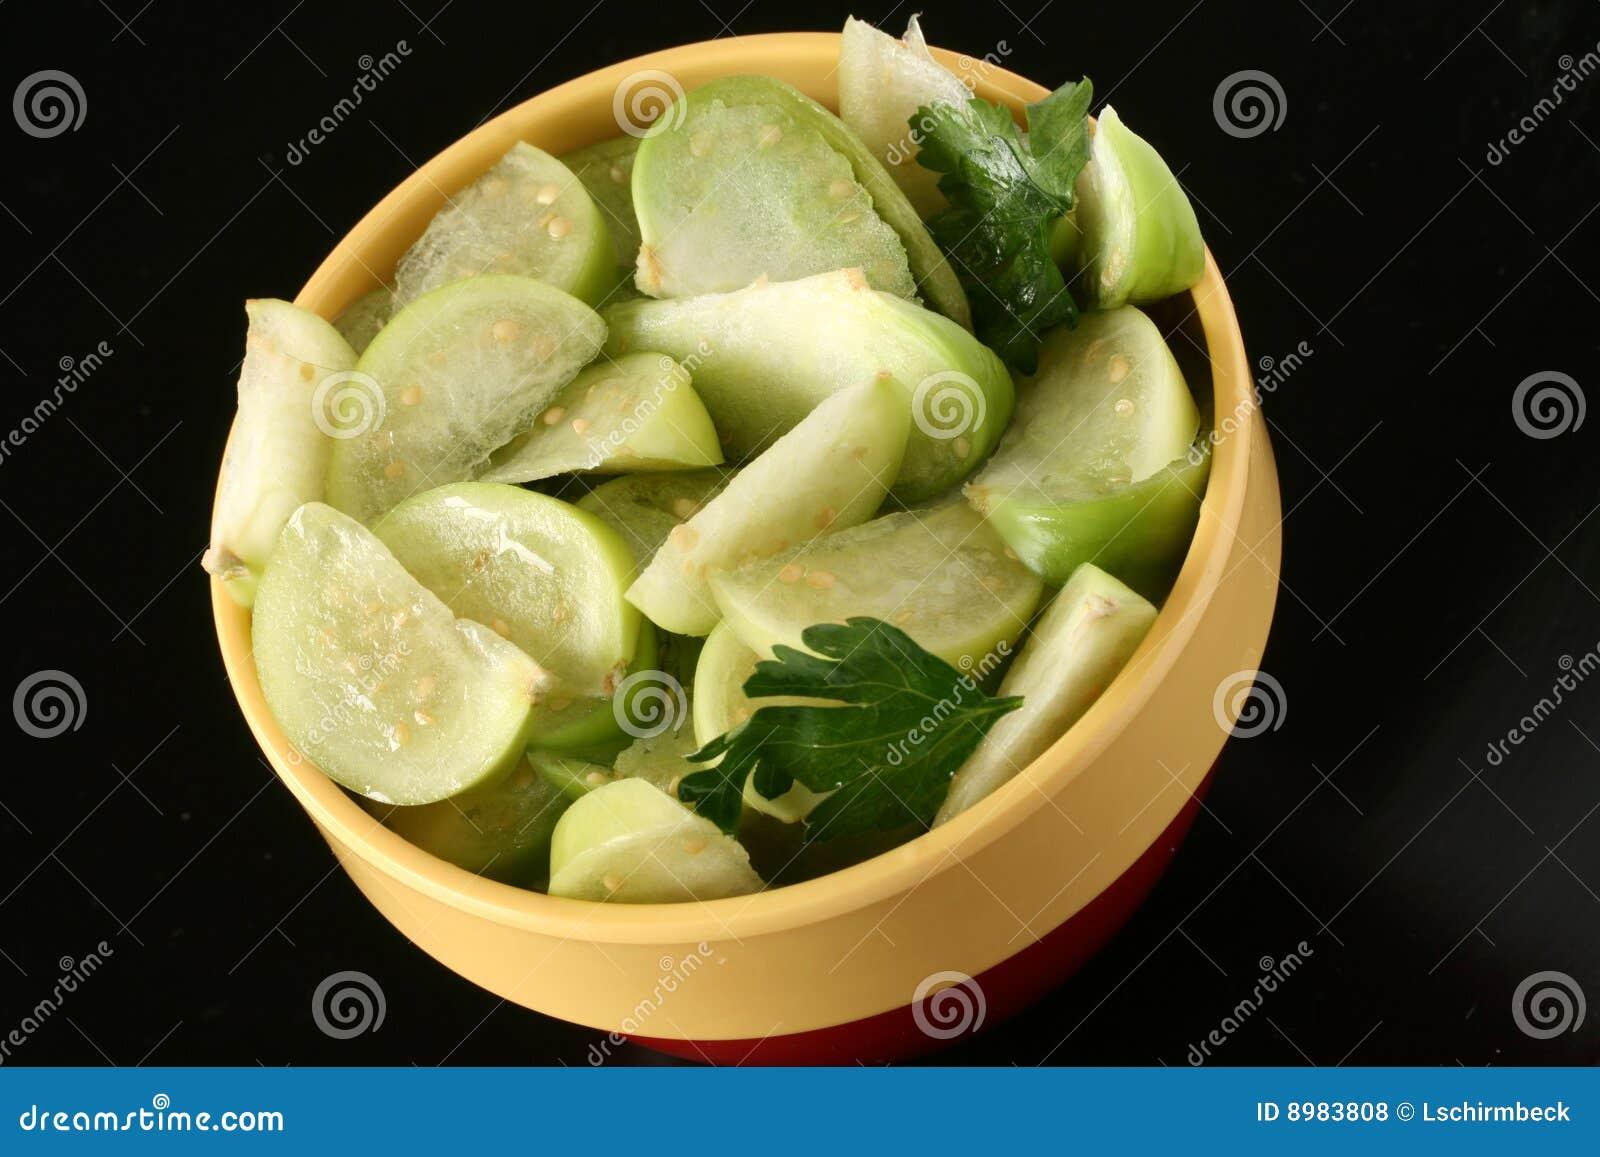 how to cut fresh cilantro